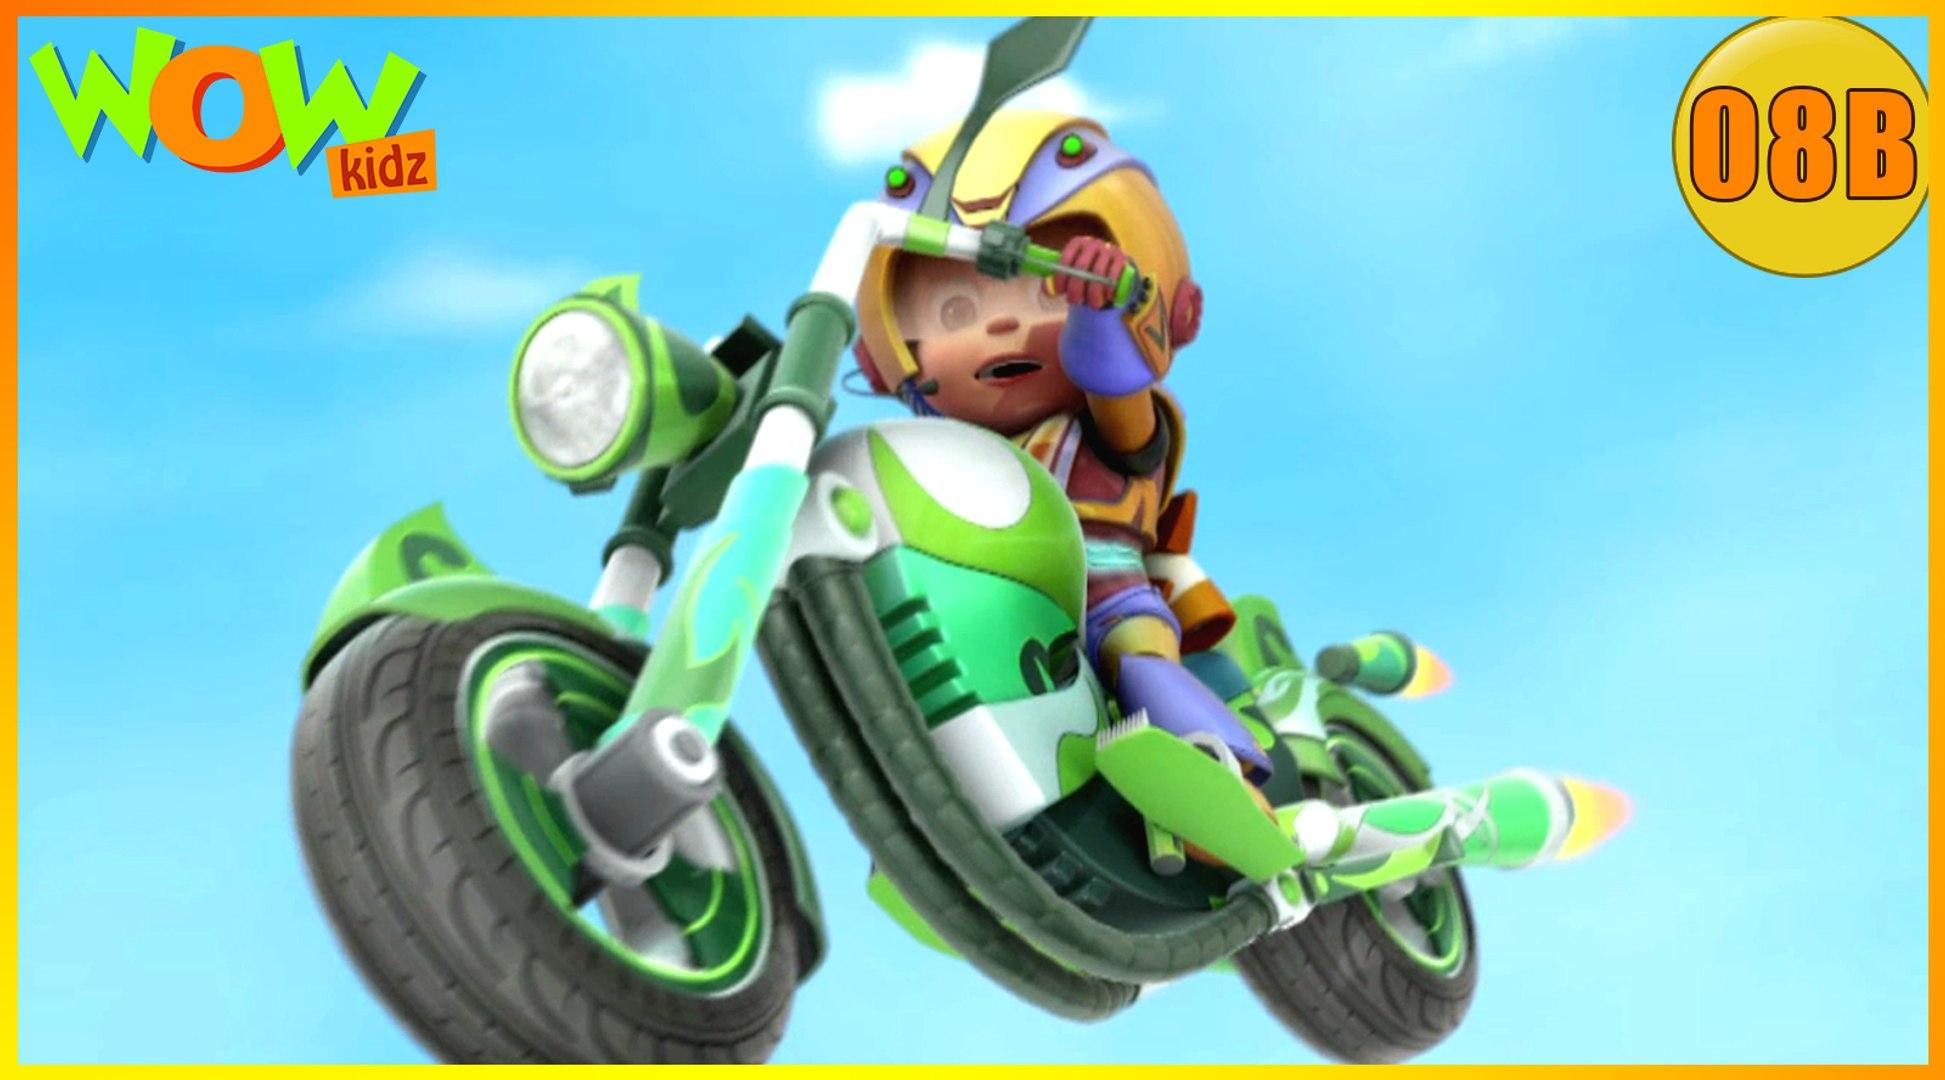 Vir The Robot Boy   The Mad Bike   Action Cartoon for Kids   Wow Kidz